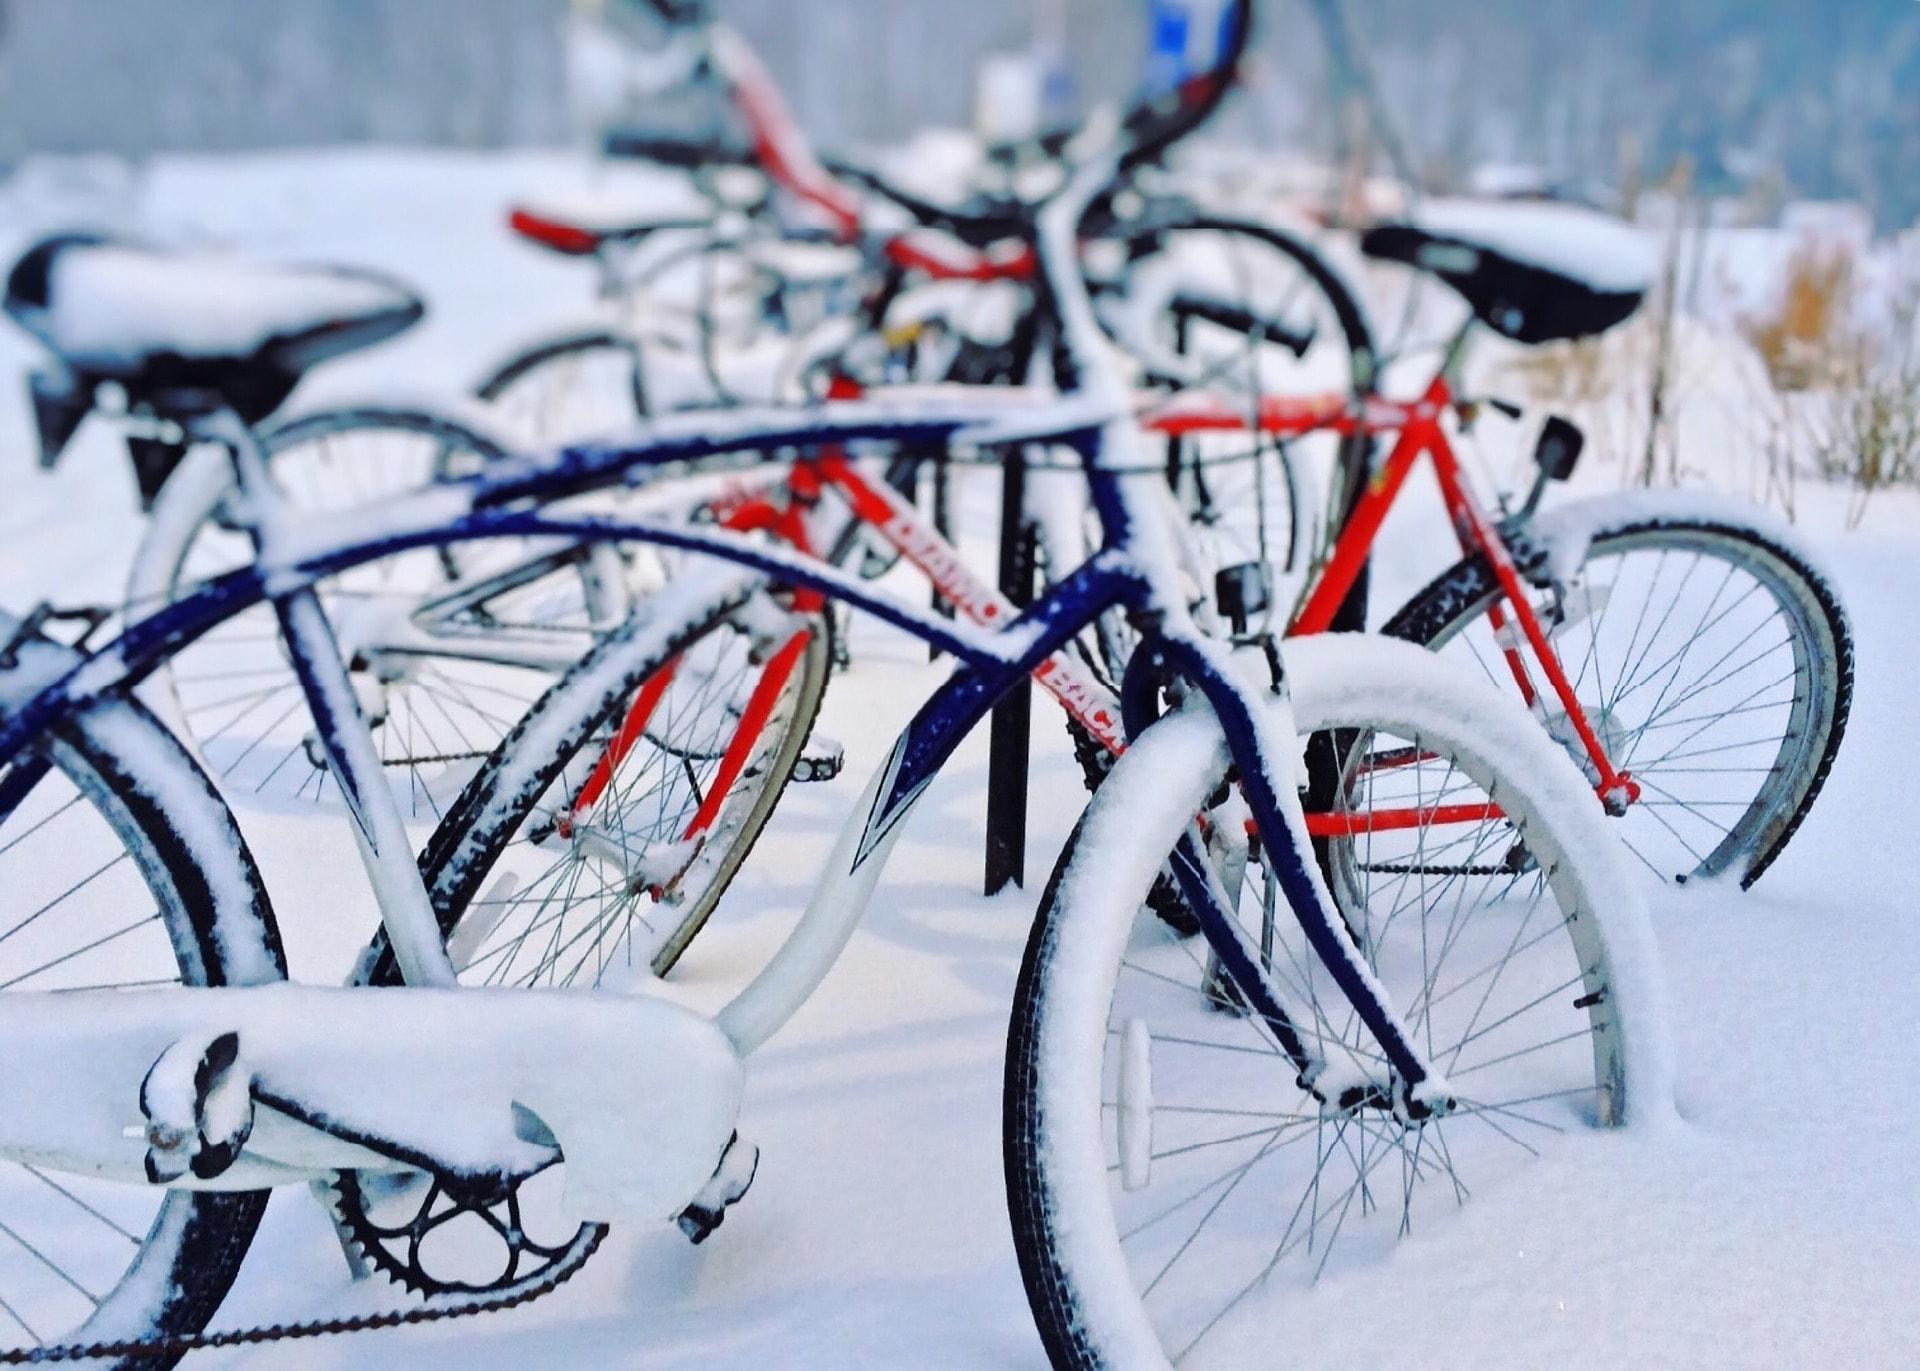 fahrr der im schnee min fahrrad selber reparieren. Black Bedroom Furniture Sets. Home Design Ideas